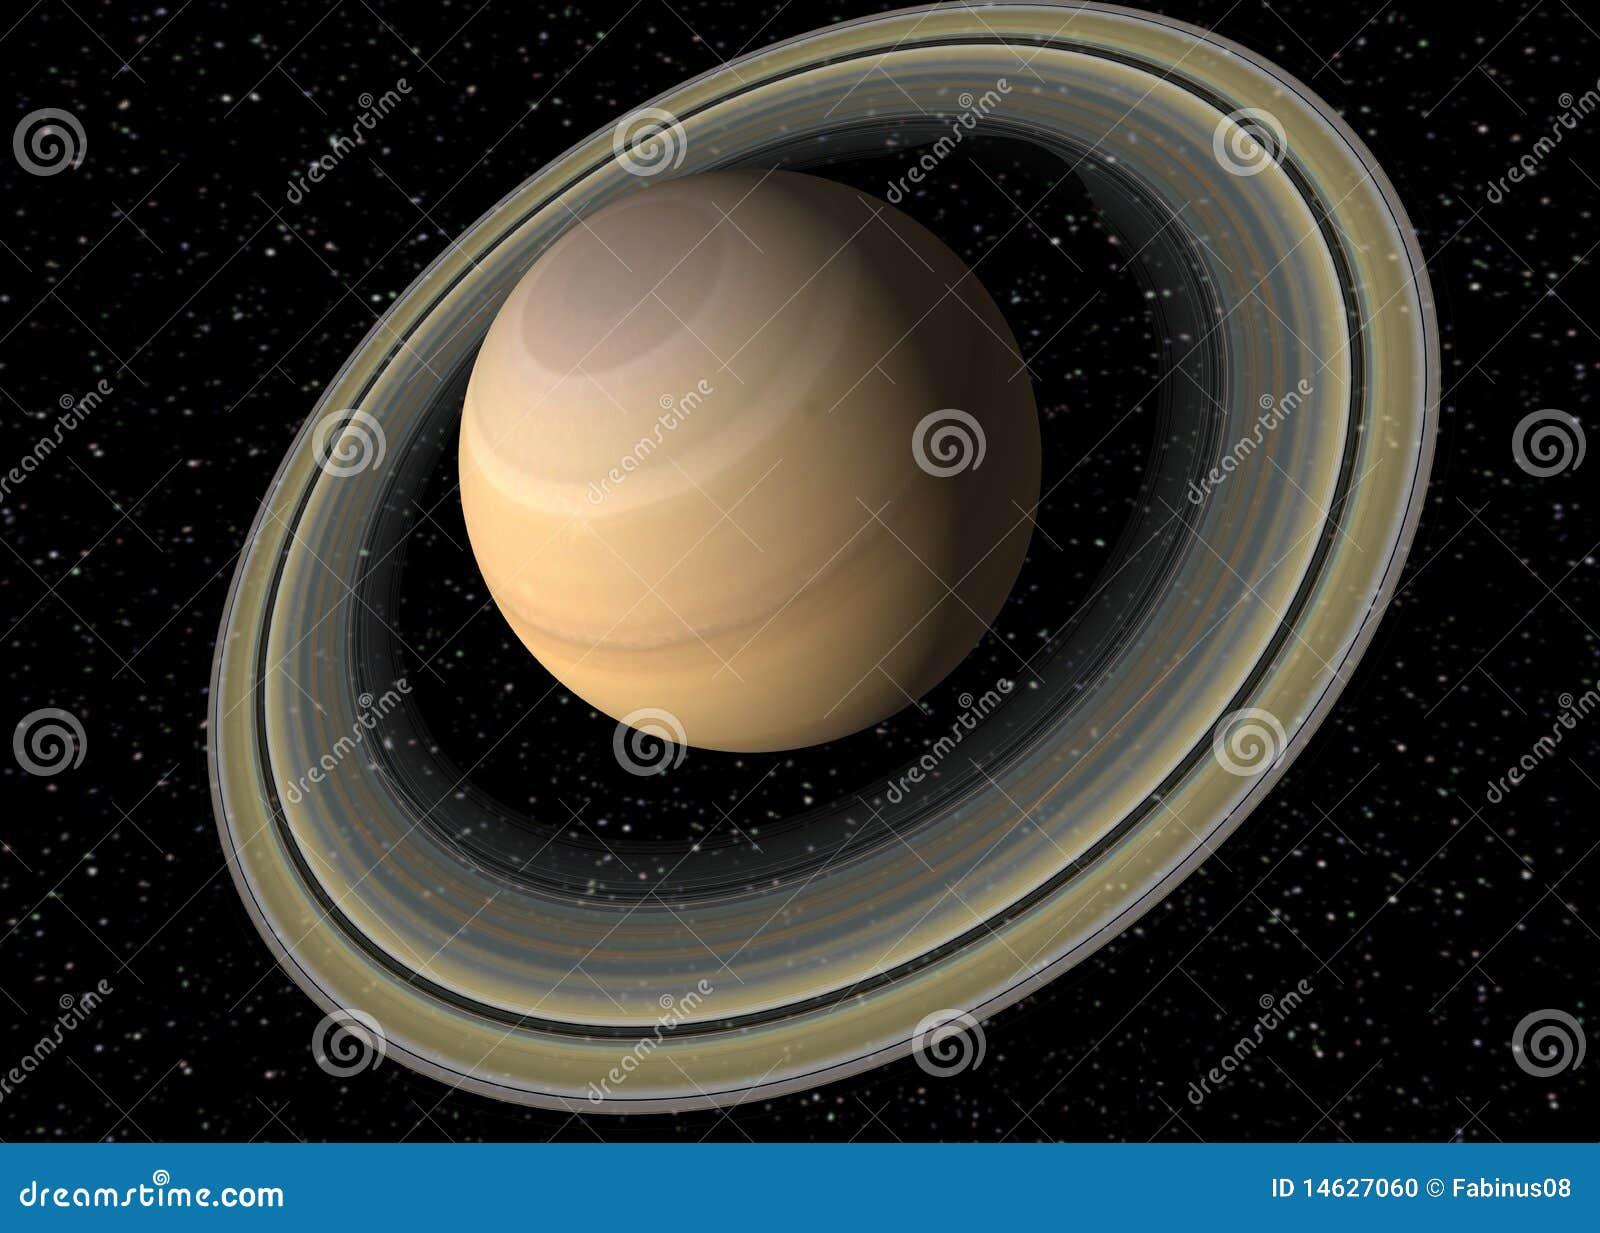 saturn planet glog - photo #27